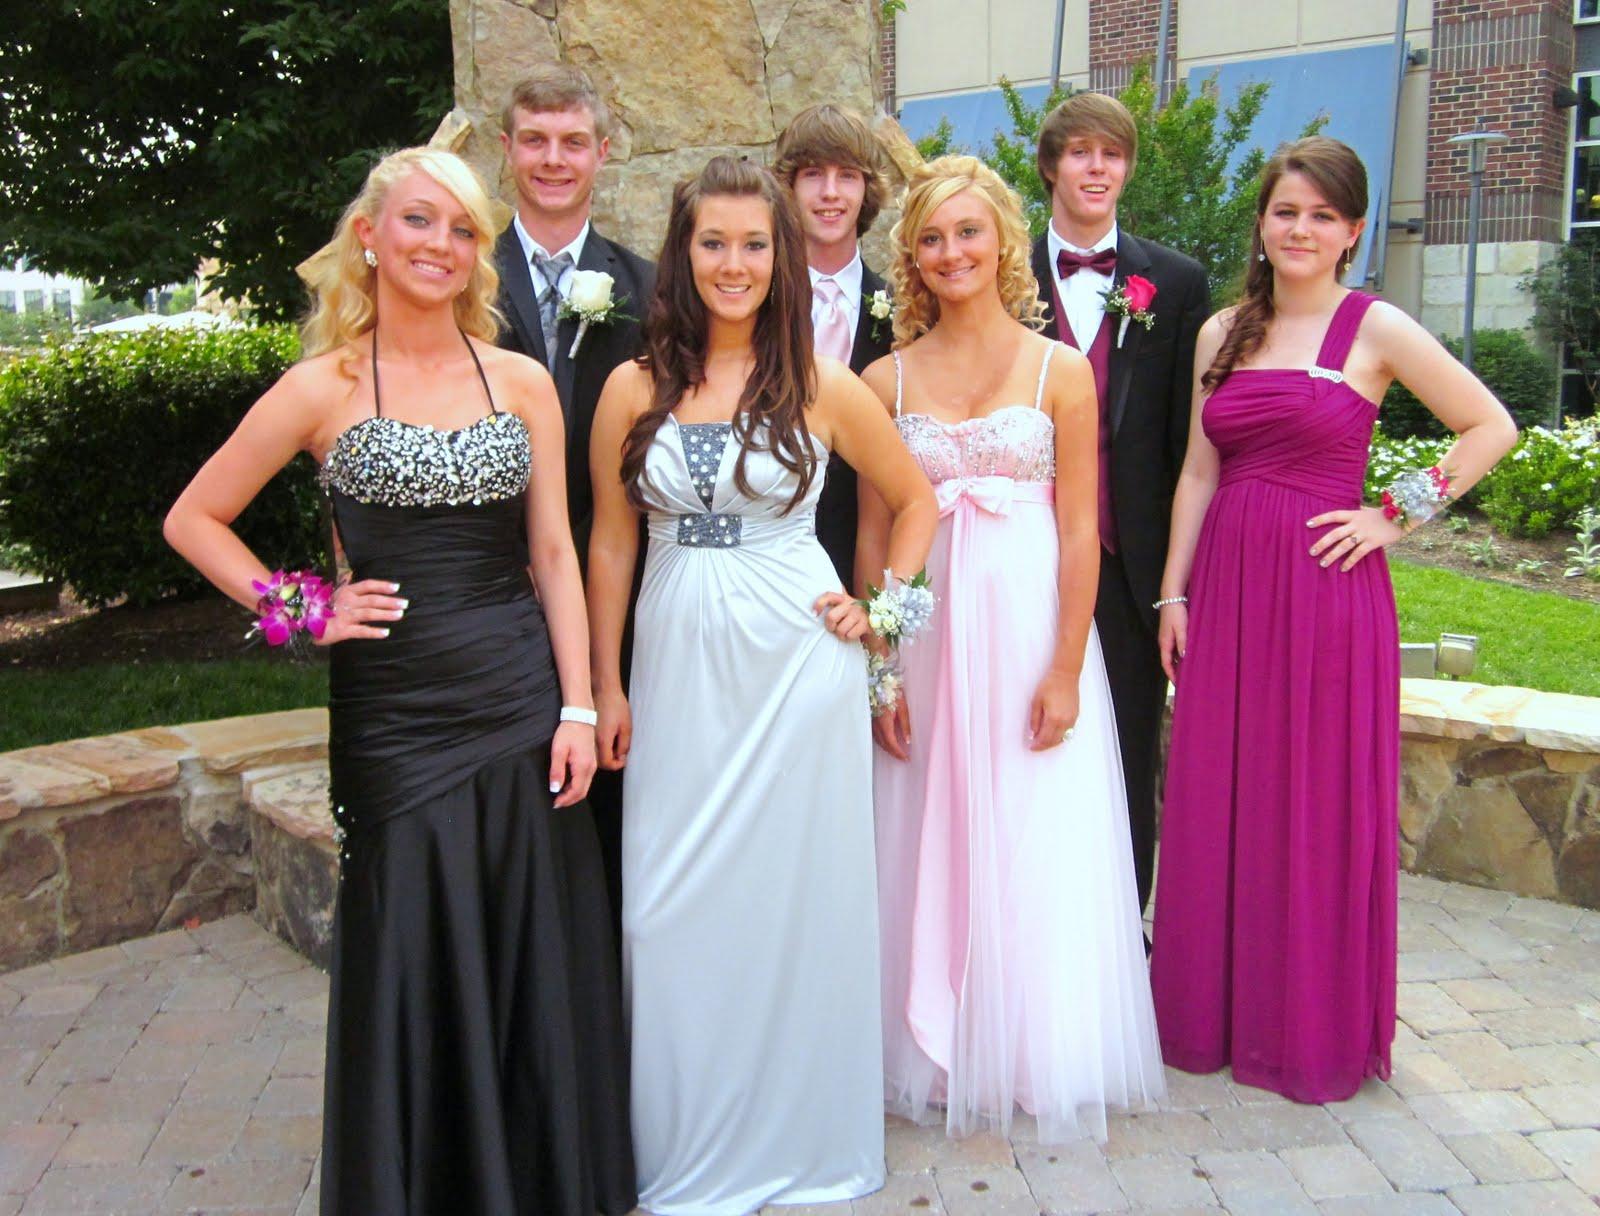 Graduation Dresses for High School Seniors